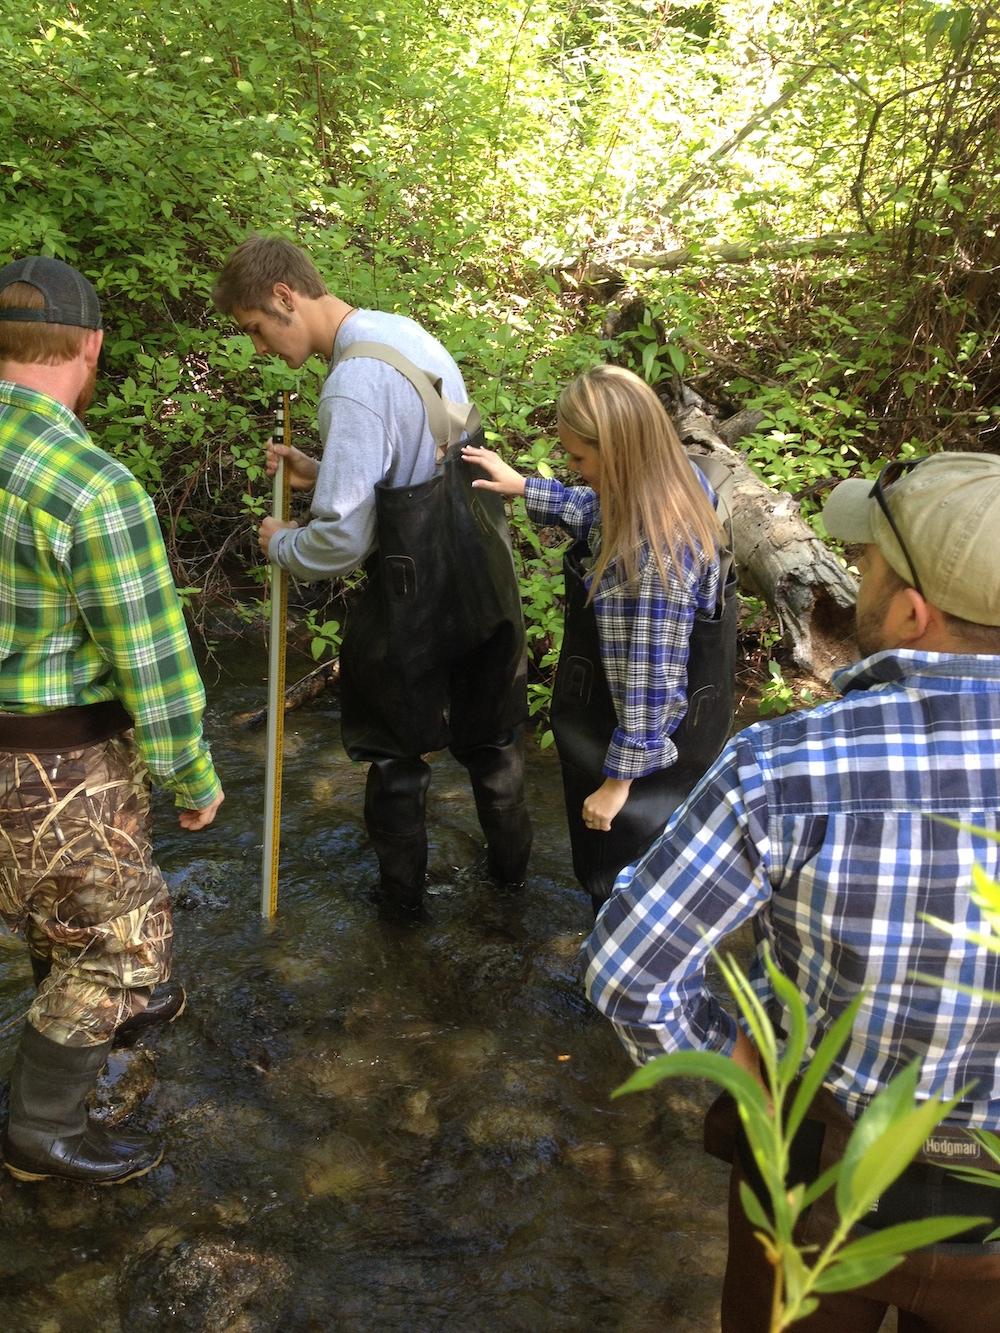 Kids in the Creek - hands-on outdoor education program